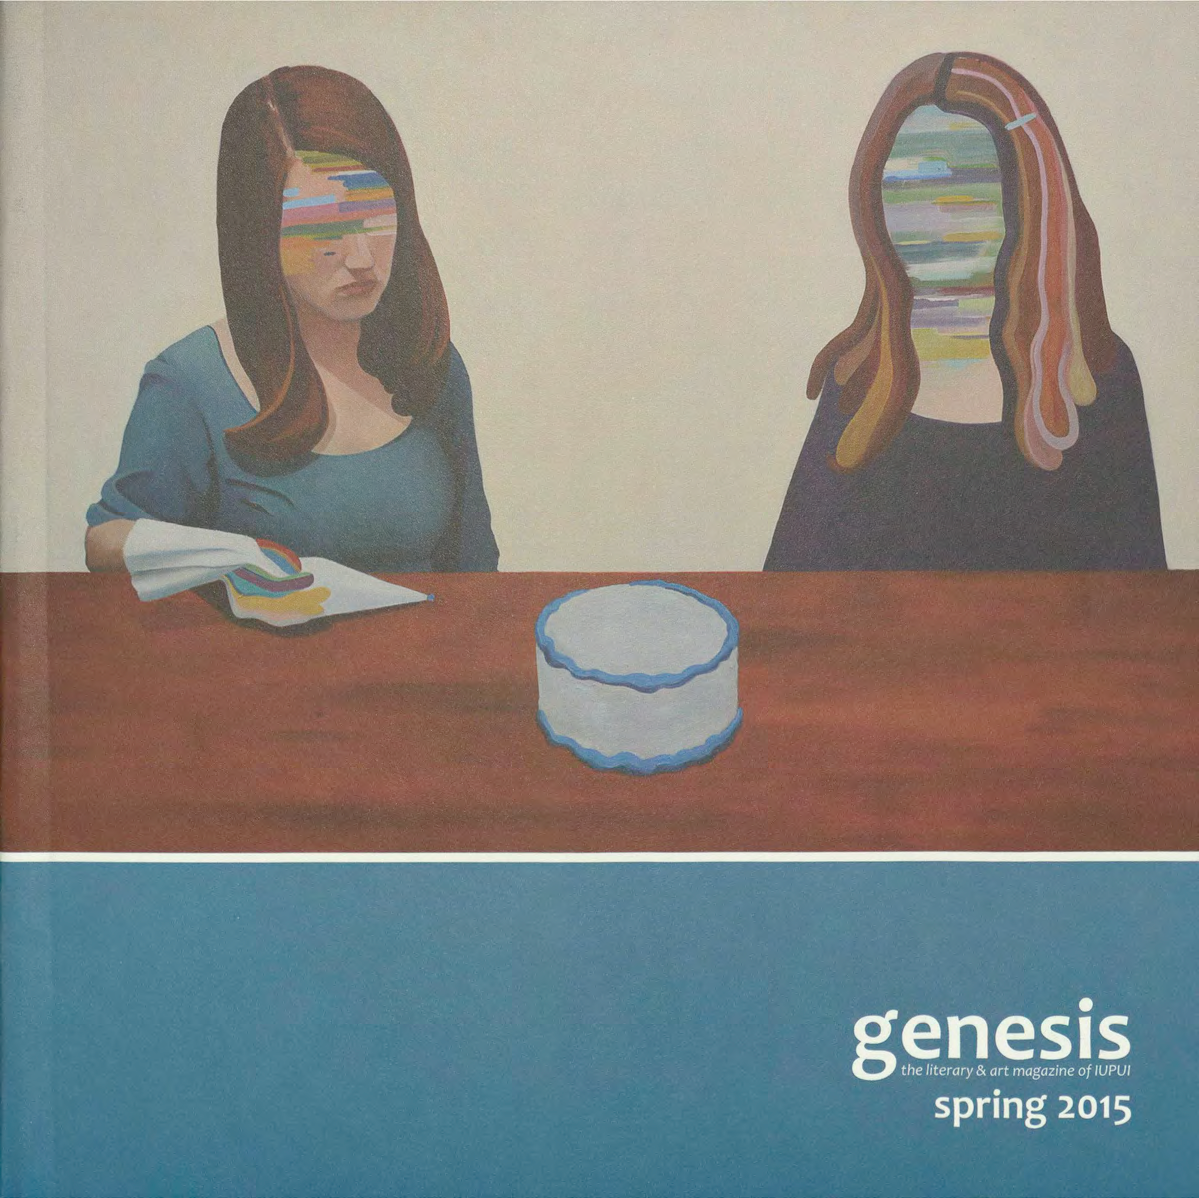 genesis spring 2015 cover